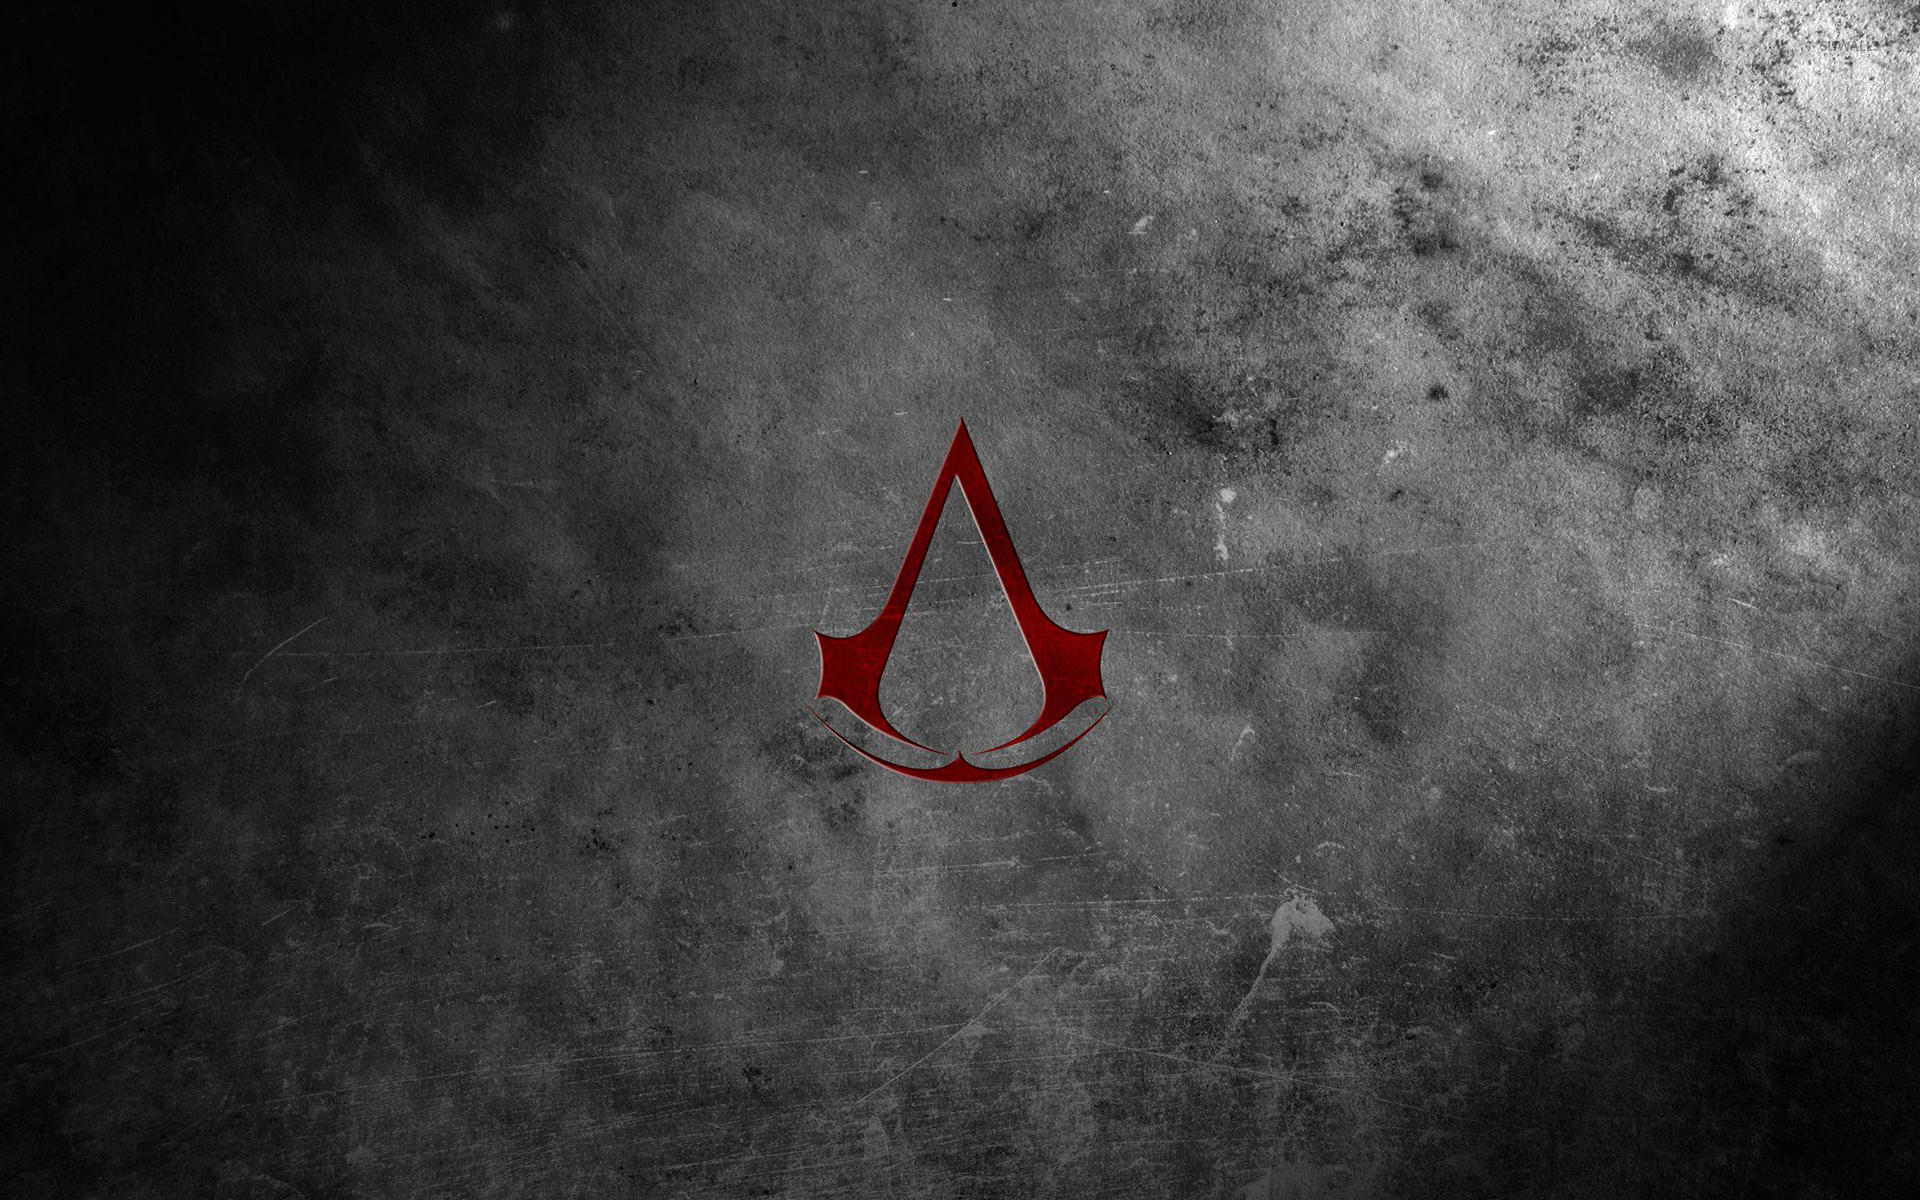 assassins creed logo wallpaper hd